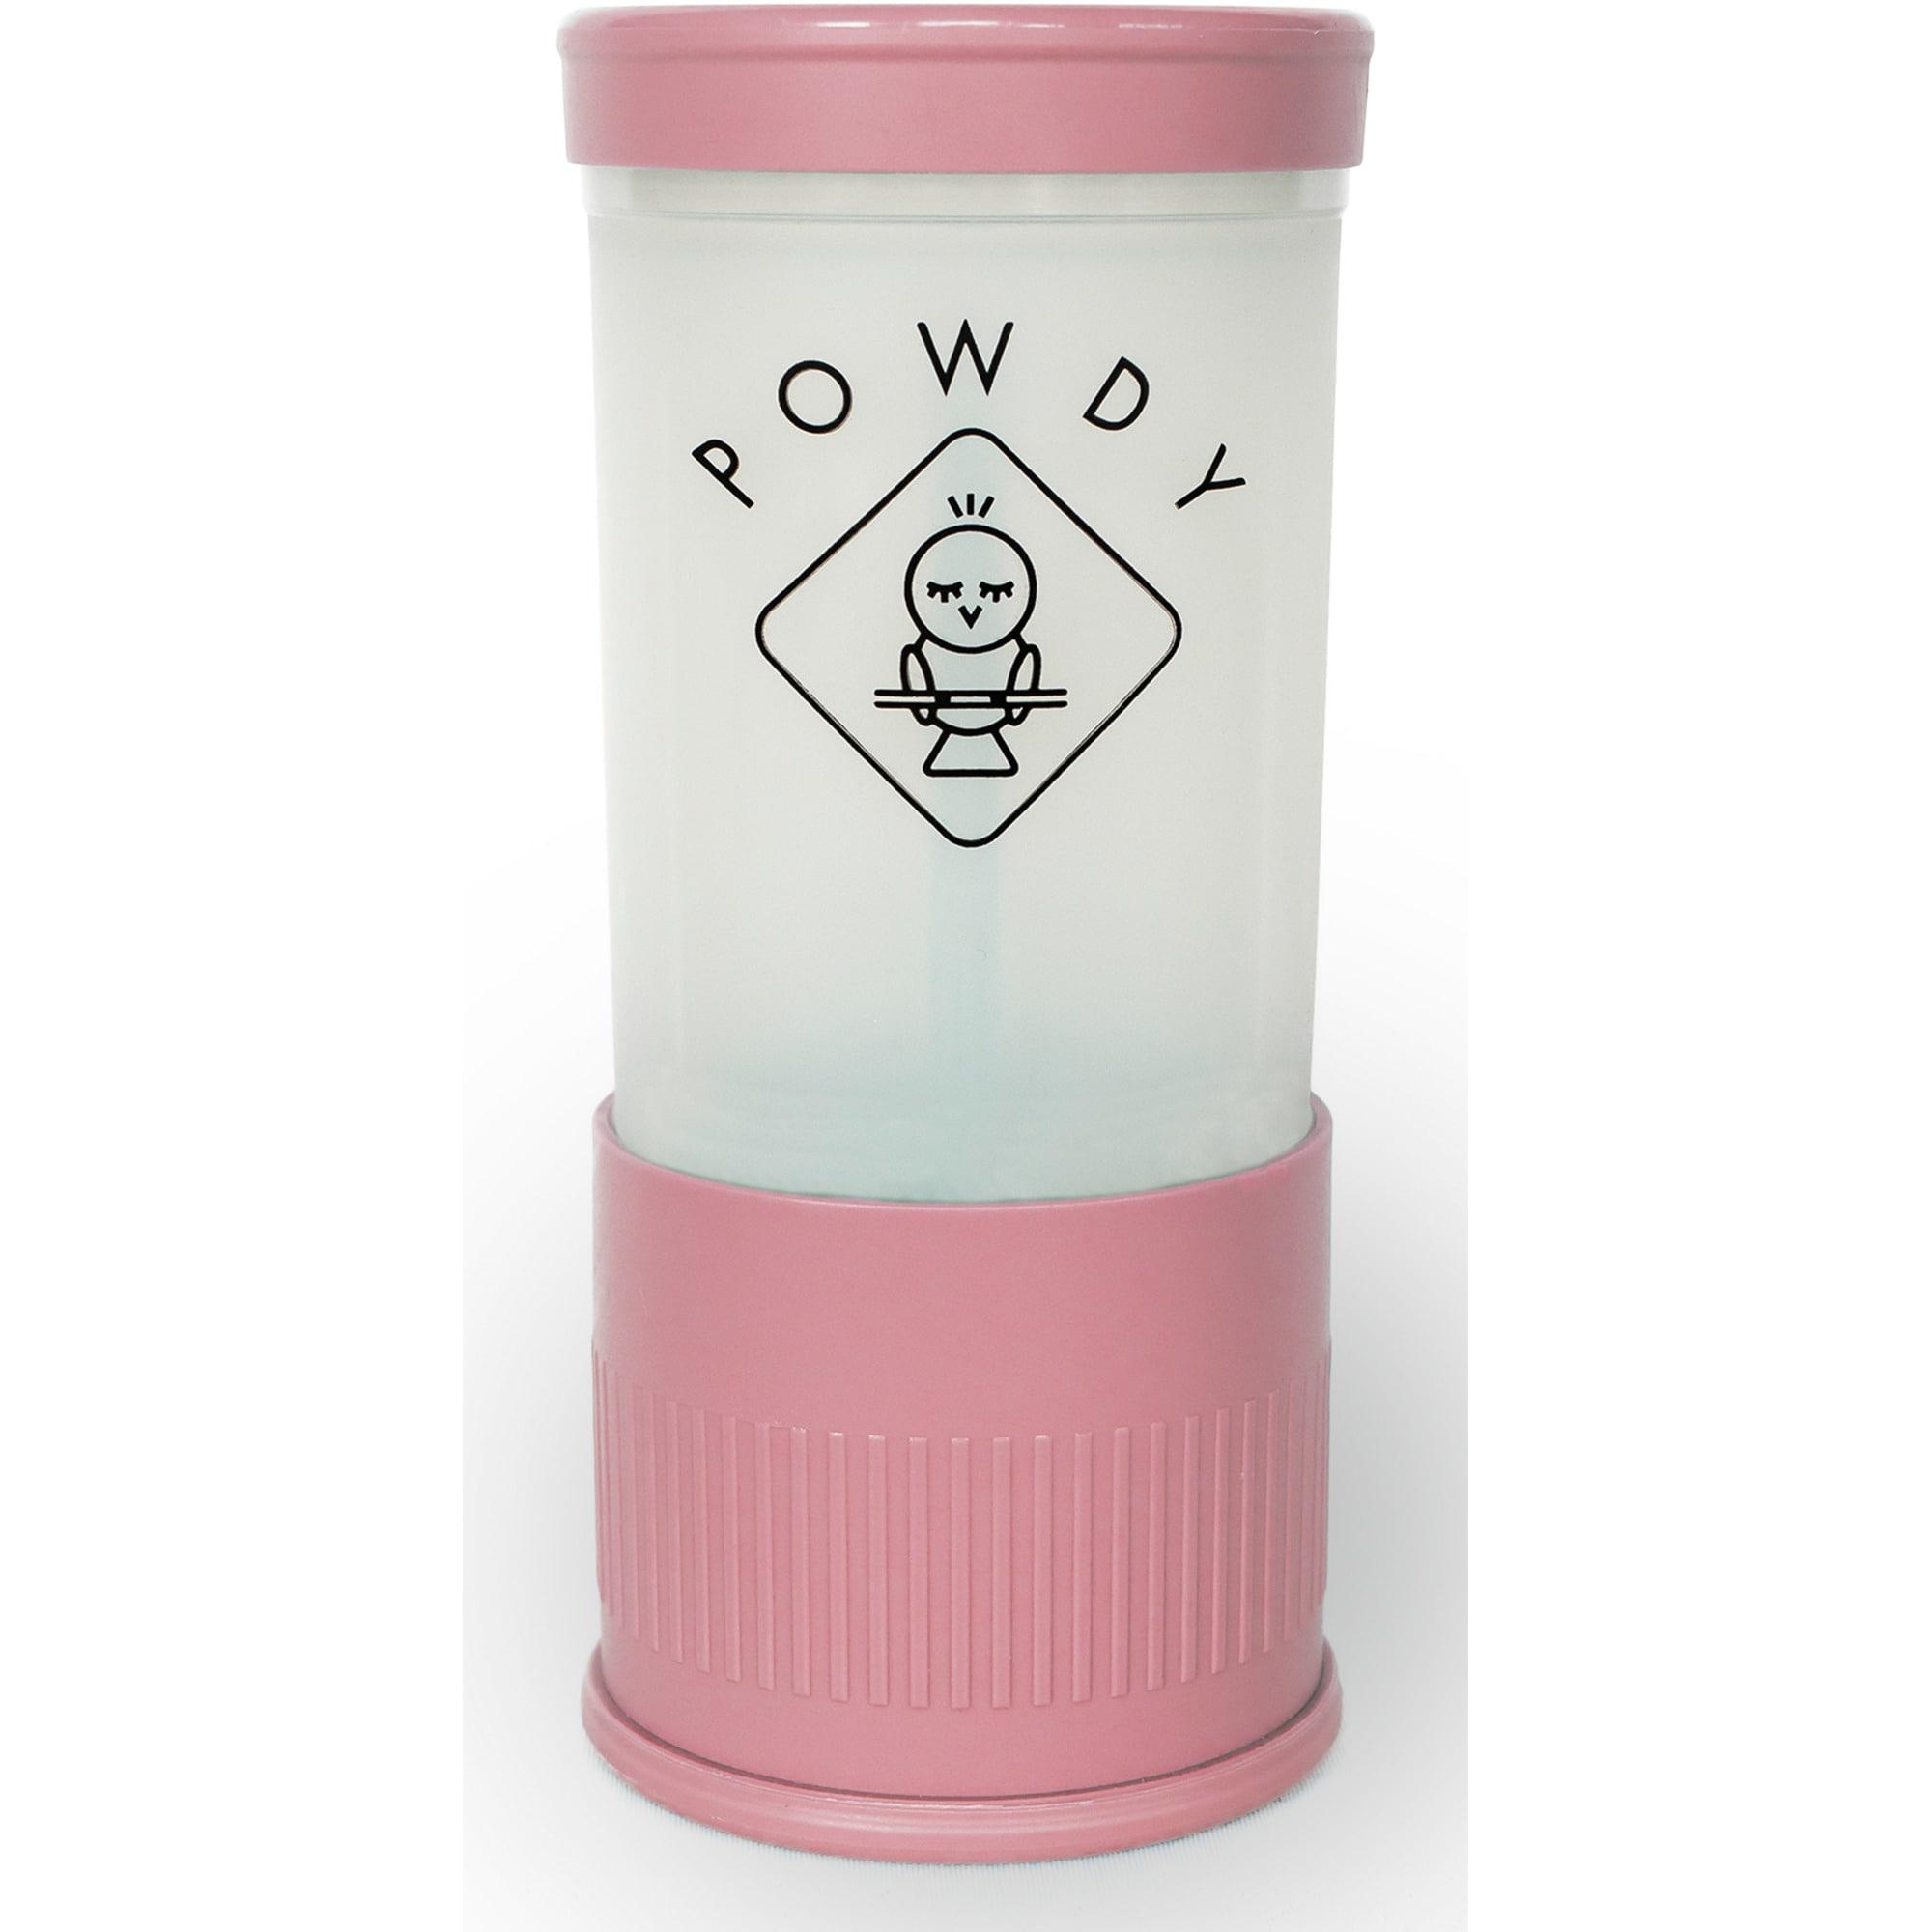 Powdy² Milchpulverportionierer rosa